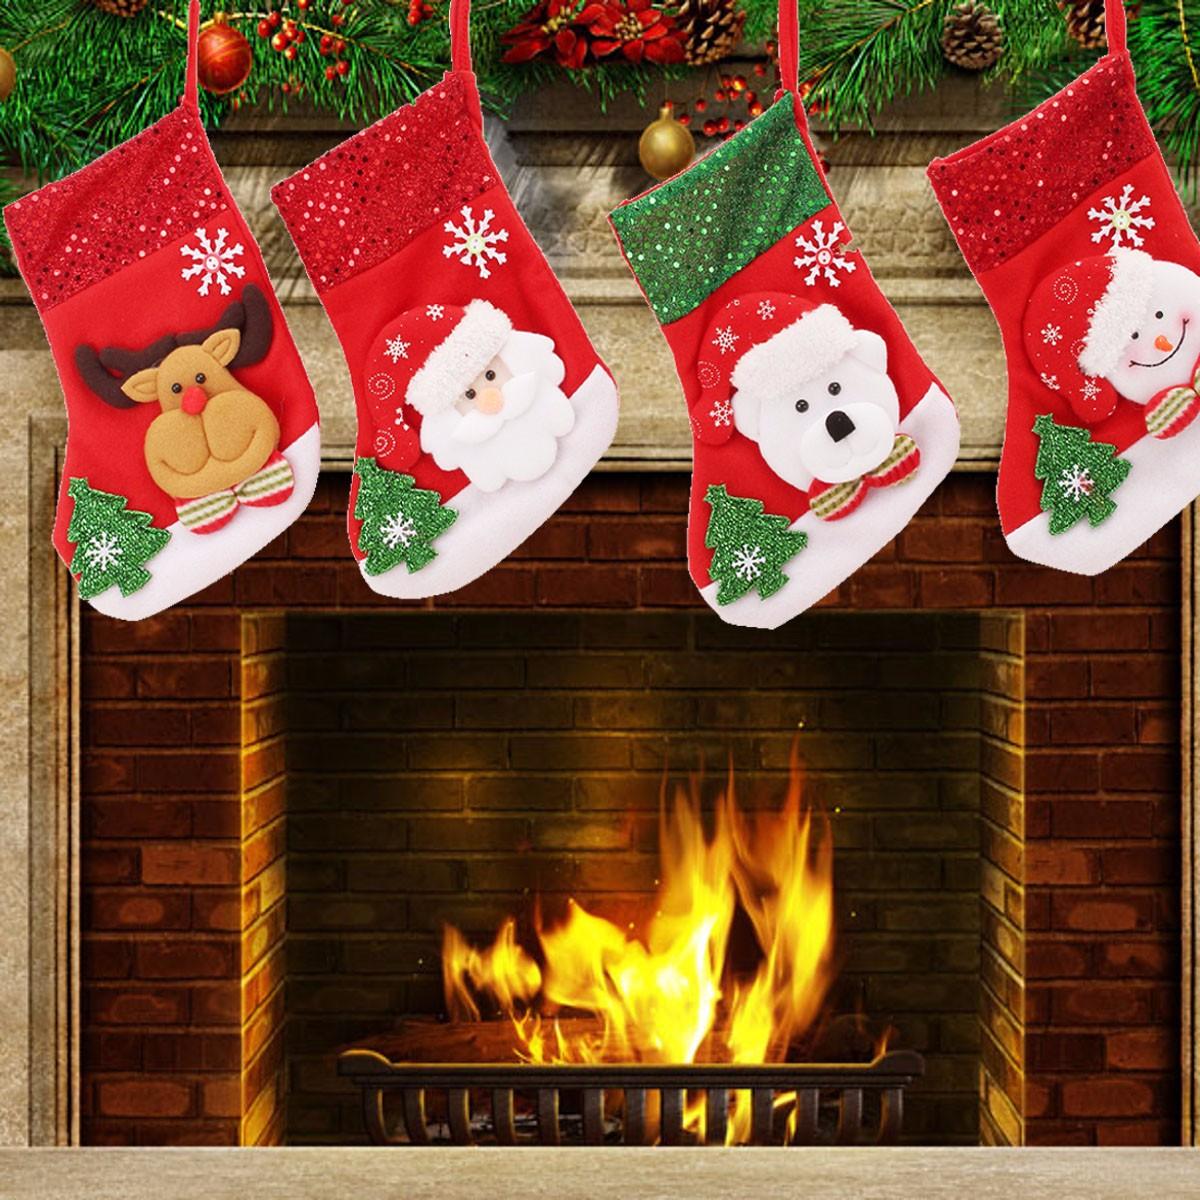 Christmas Gift Socks Bags Santa Claus Snowman Pattern Fleece Hanging Stockings For Tree Decoration